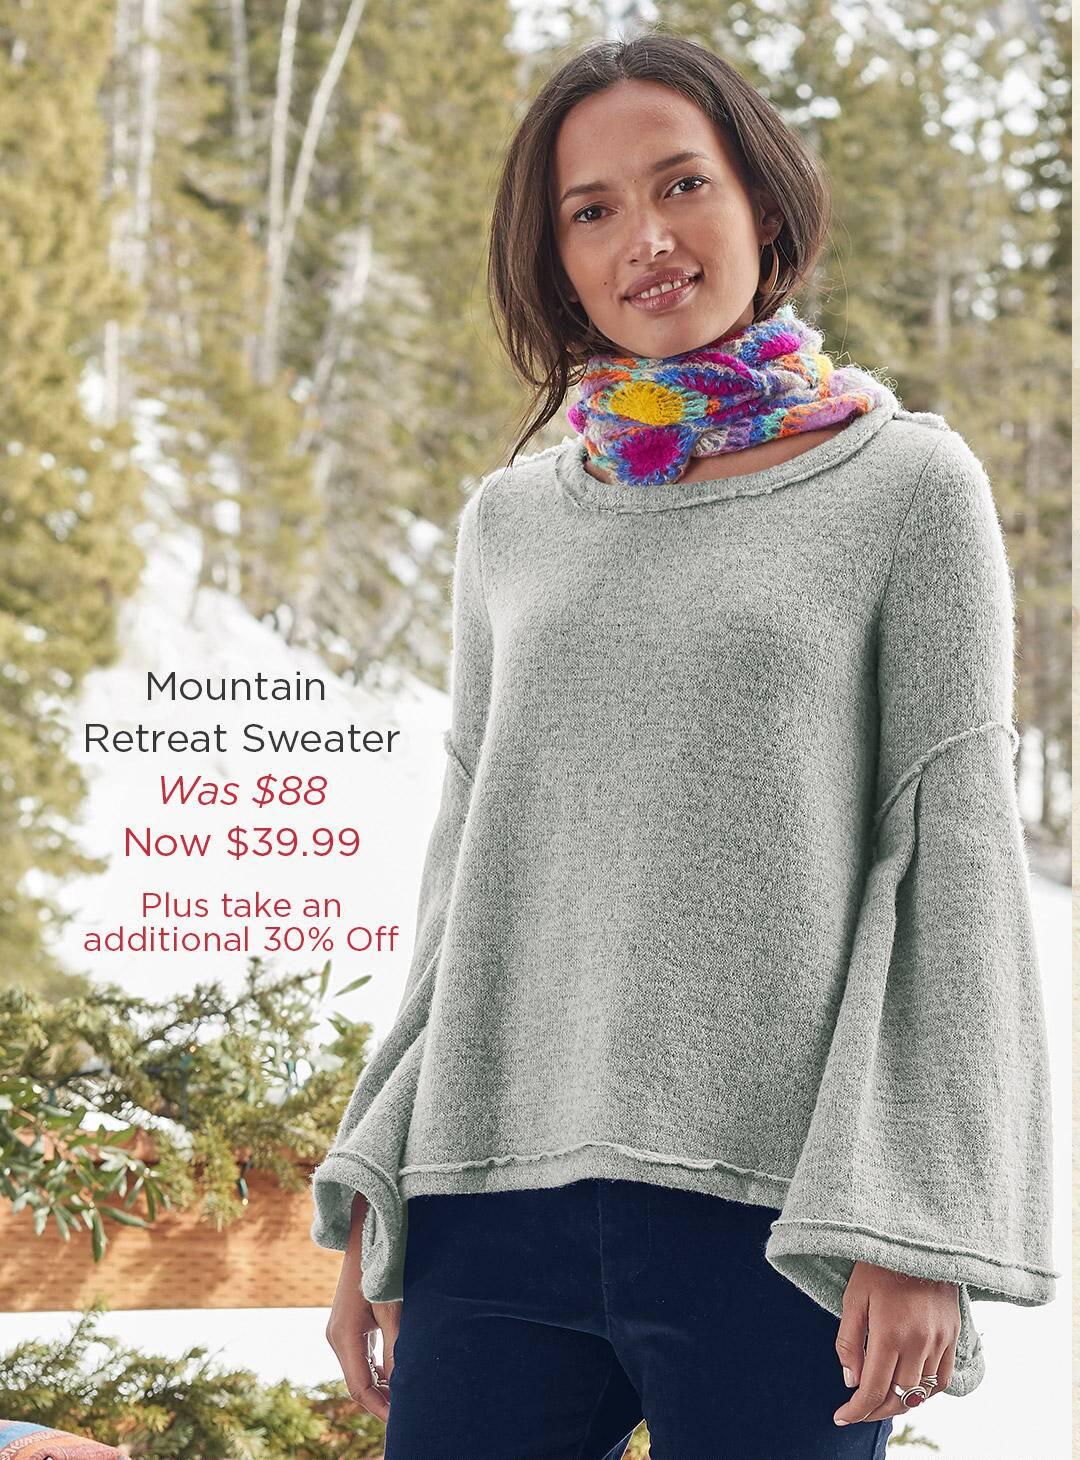 Mountain Retreat Sweater